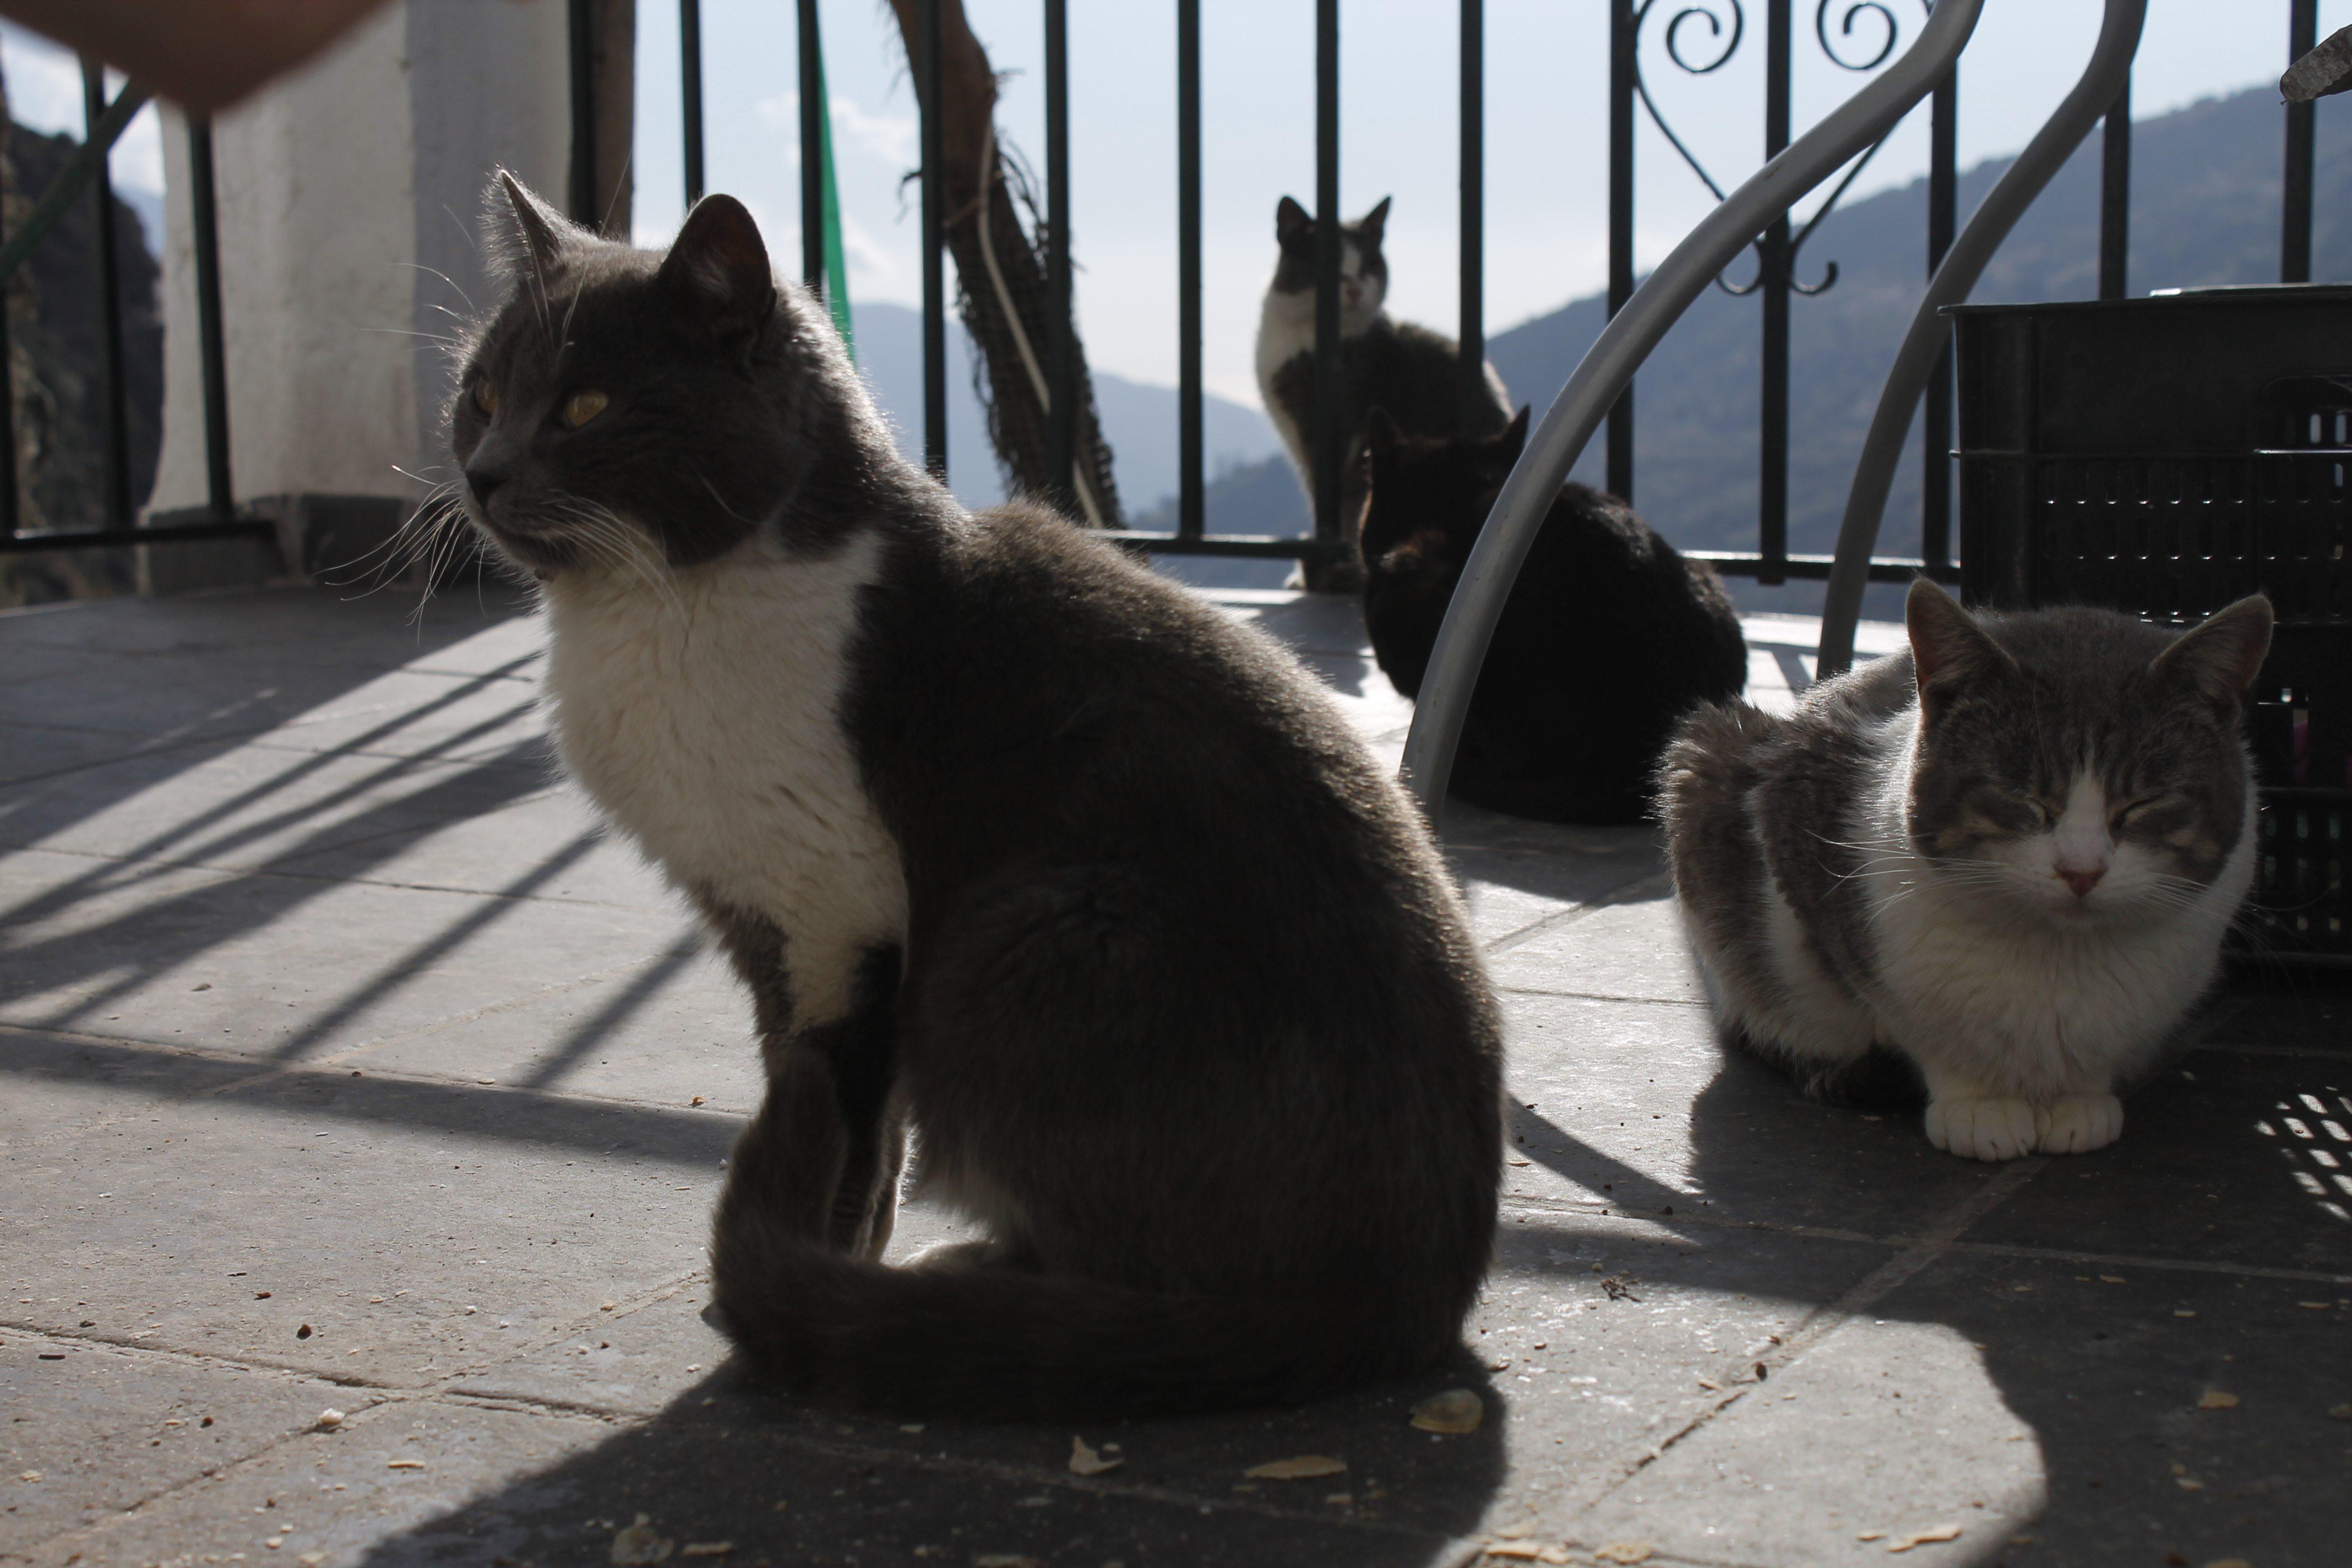 Four kitties on a terrace | AlternativeTravelers.com